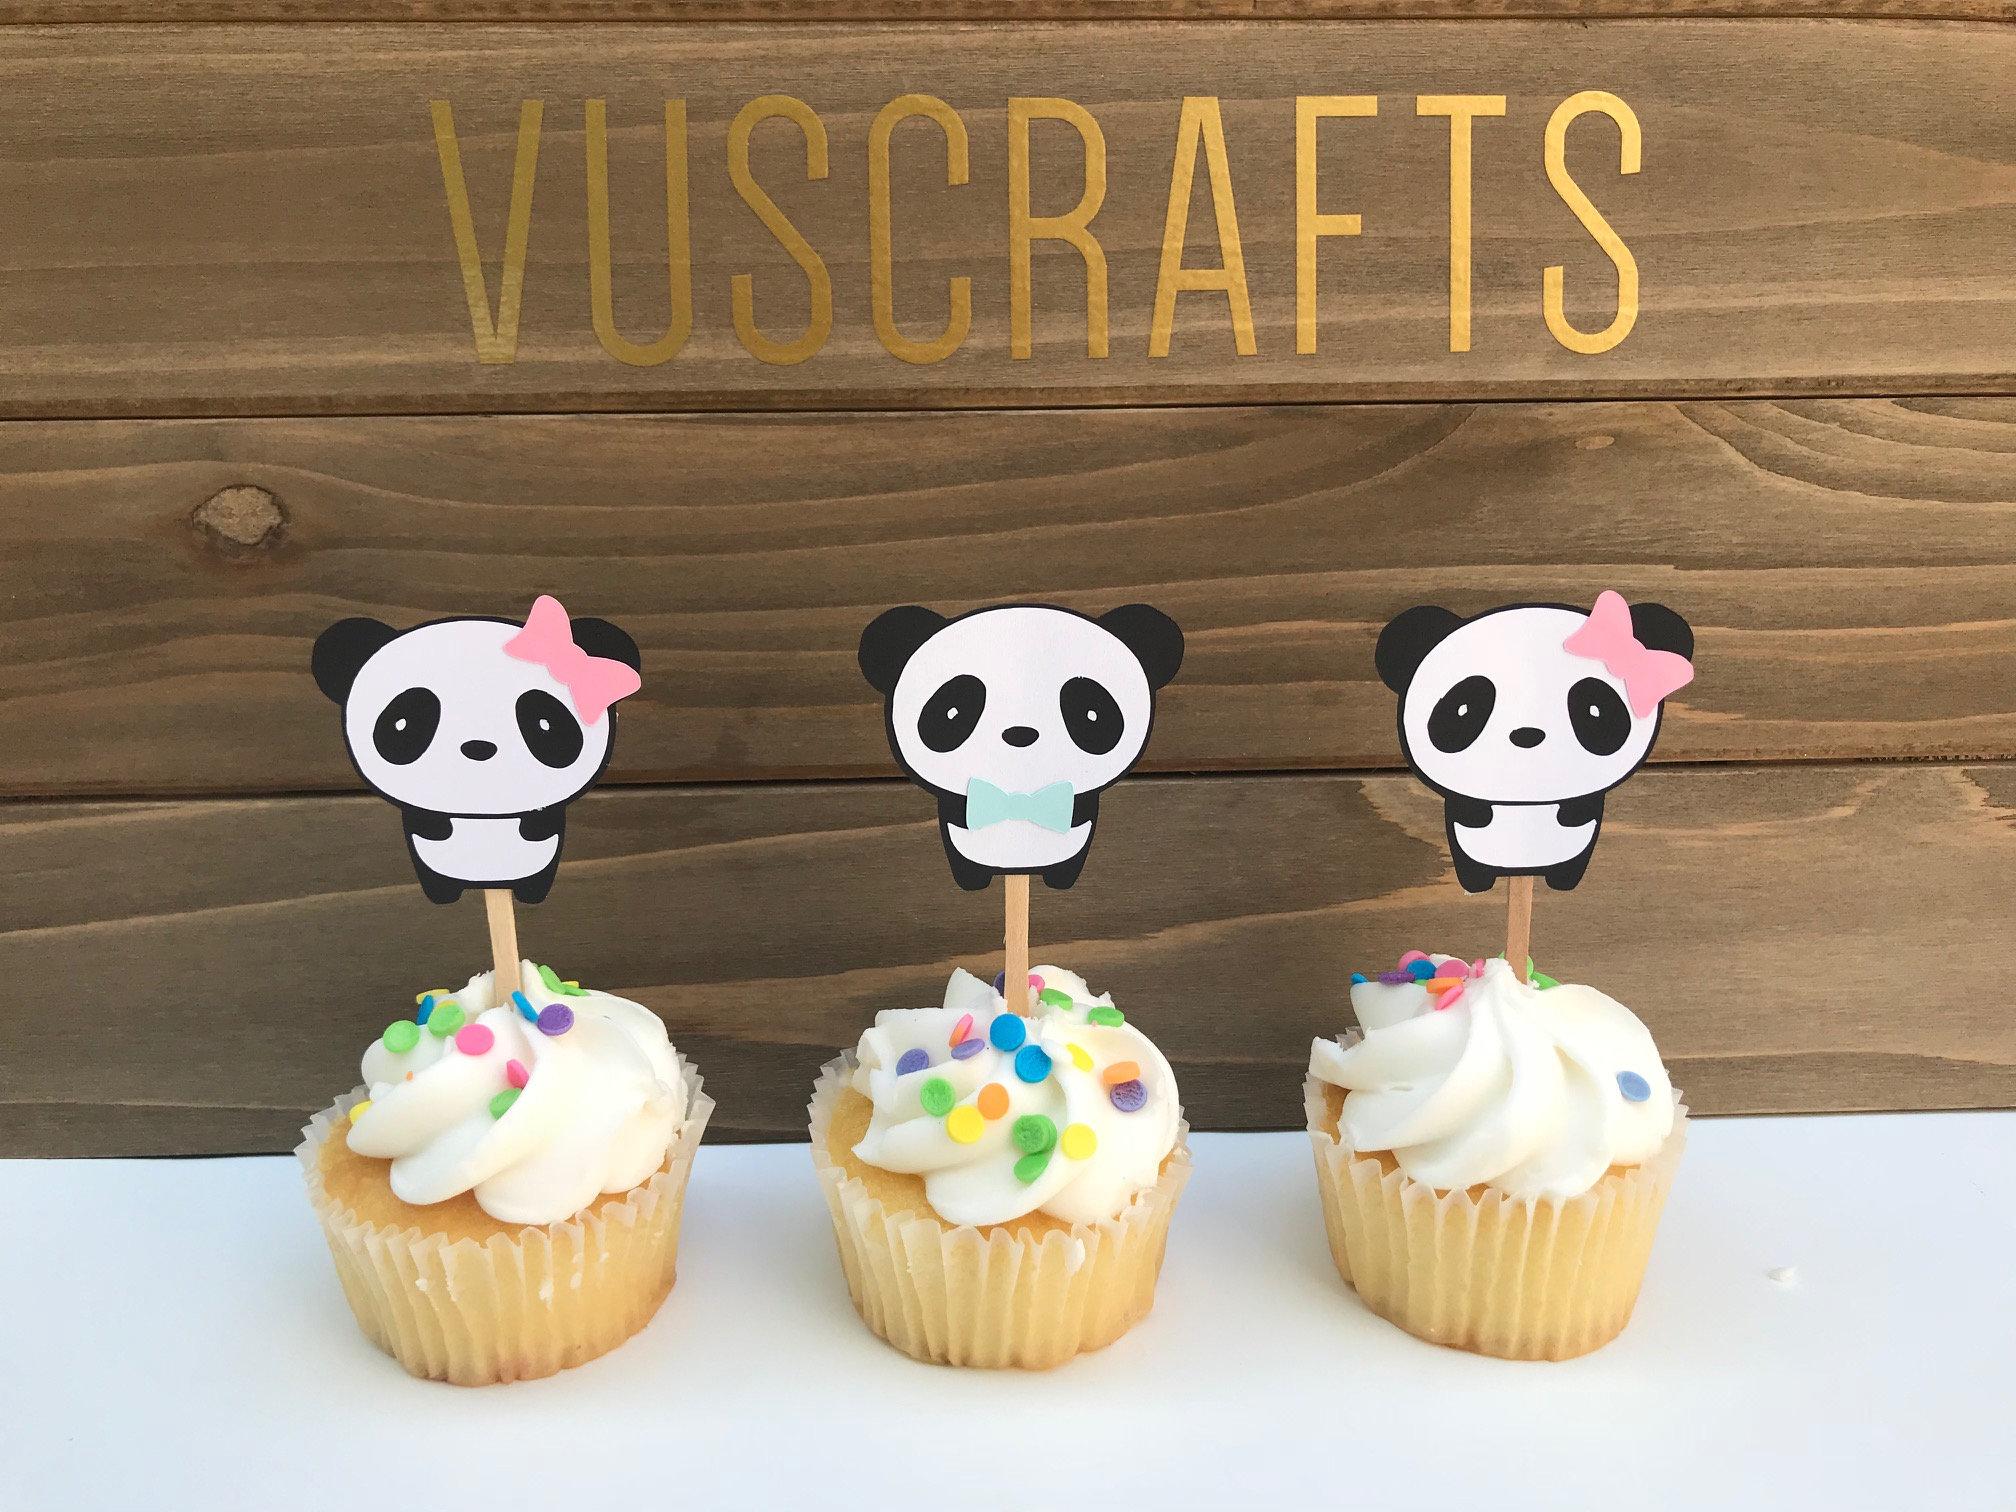 Panda Party Decorations: 12 Panda Bear Cupcake Toppers Party Picks Panda Party